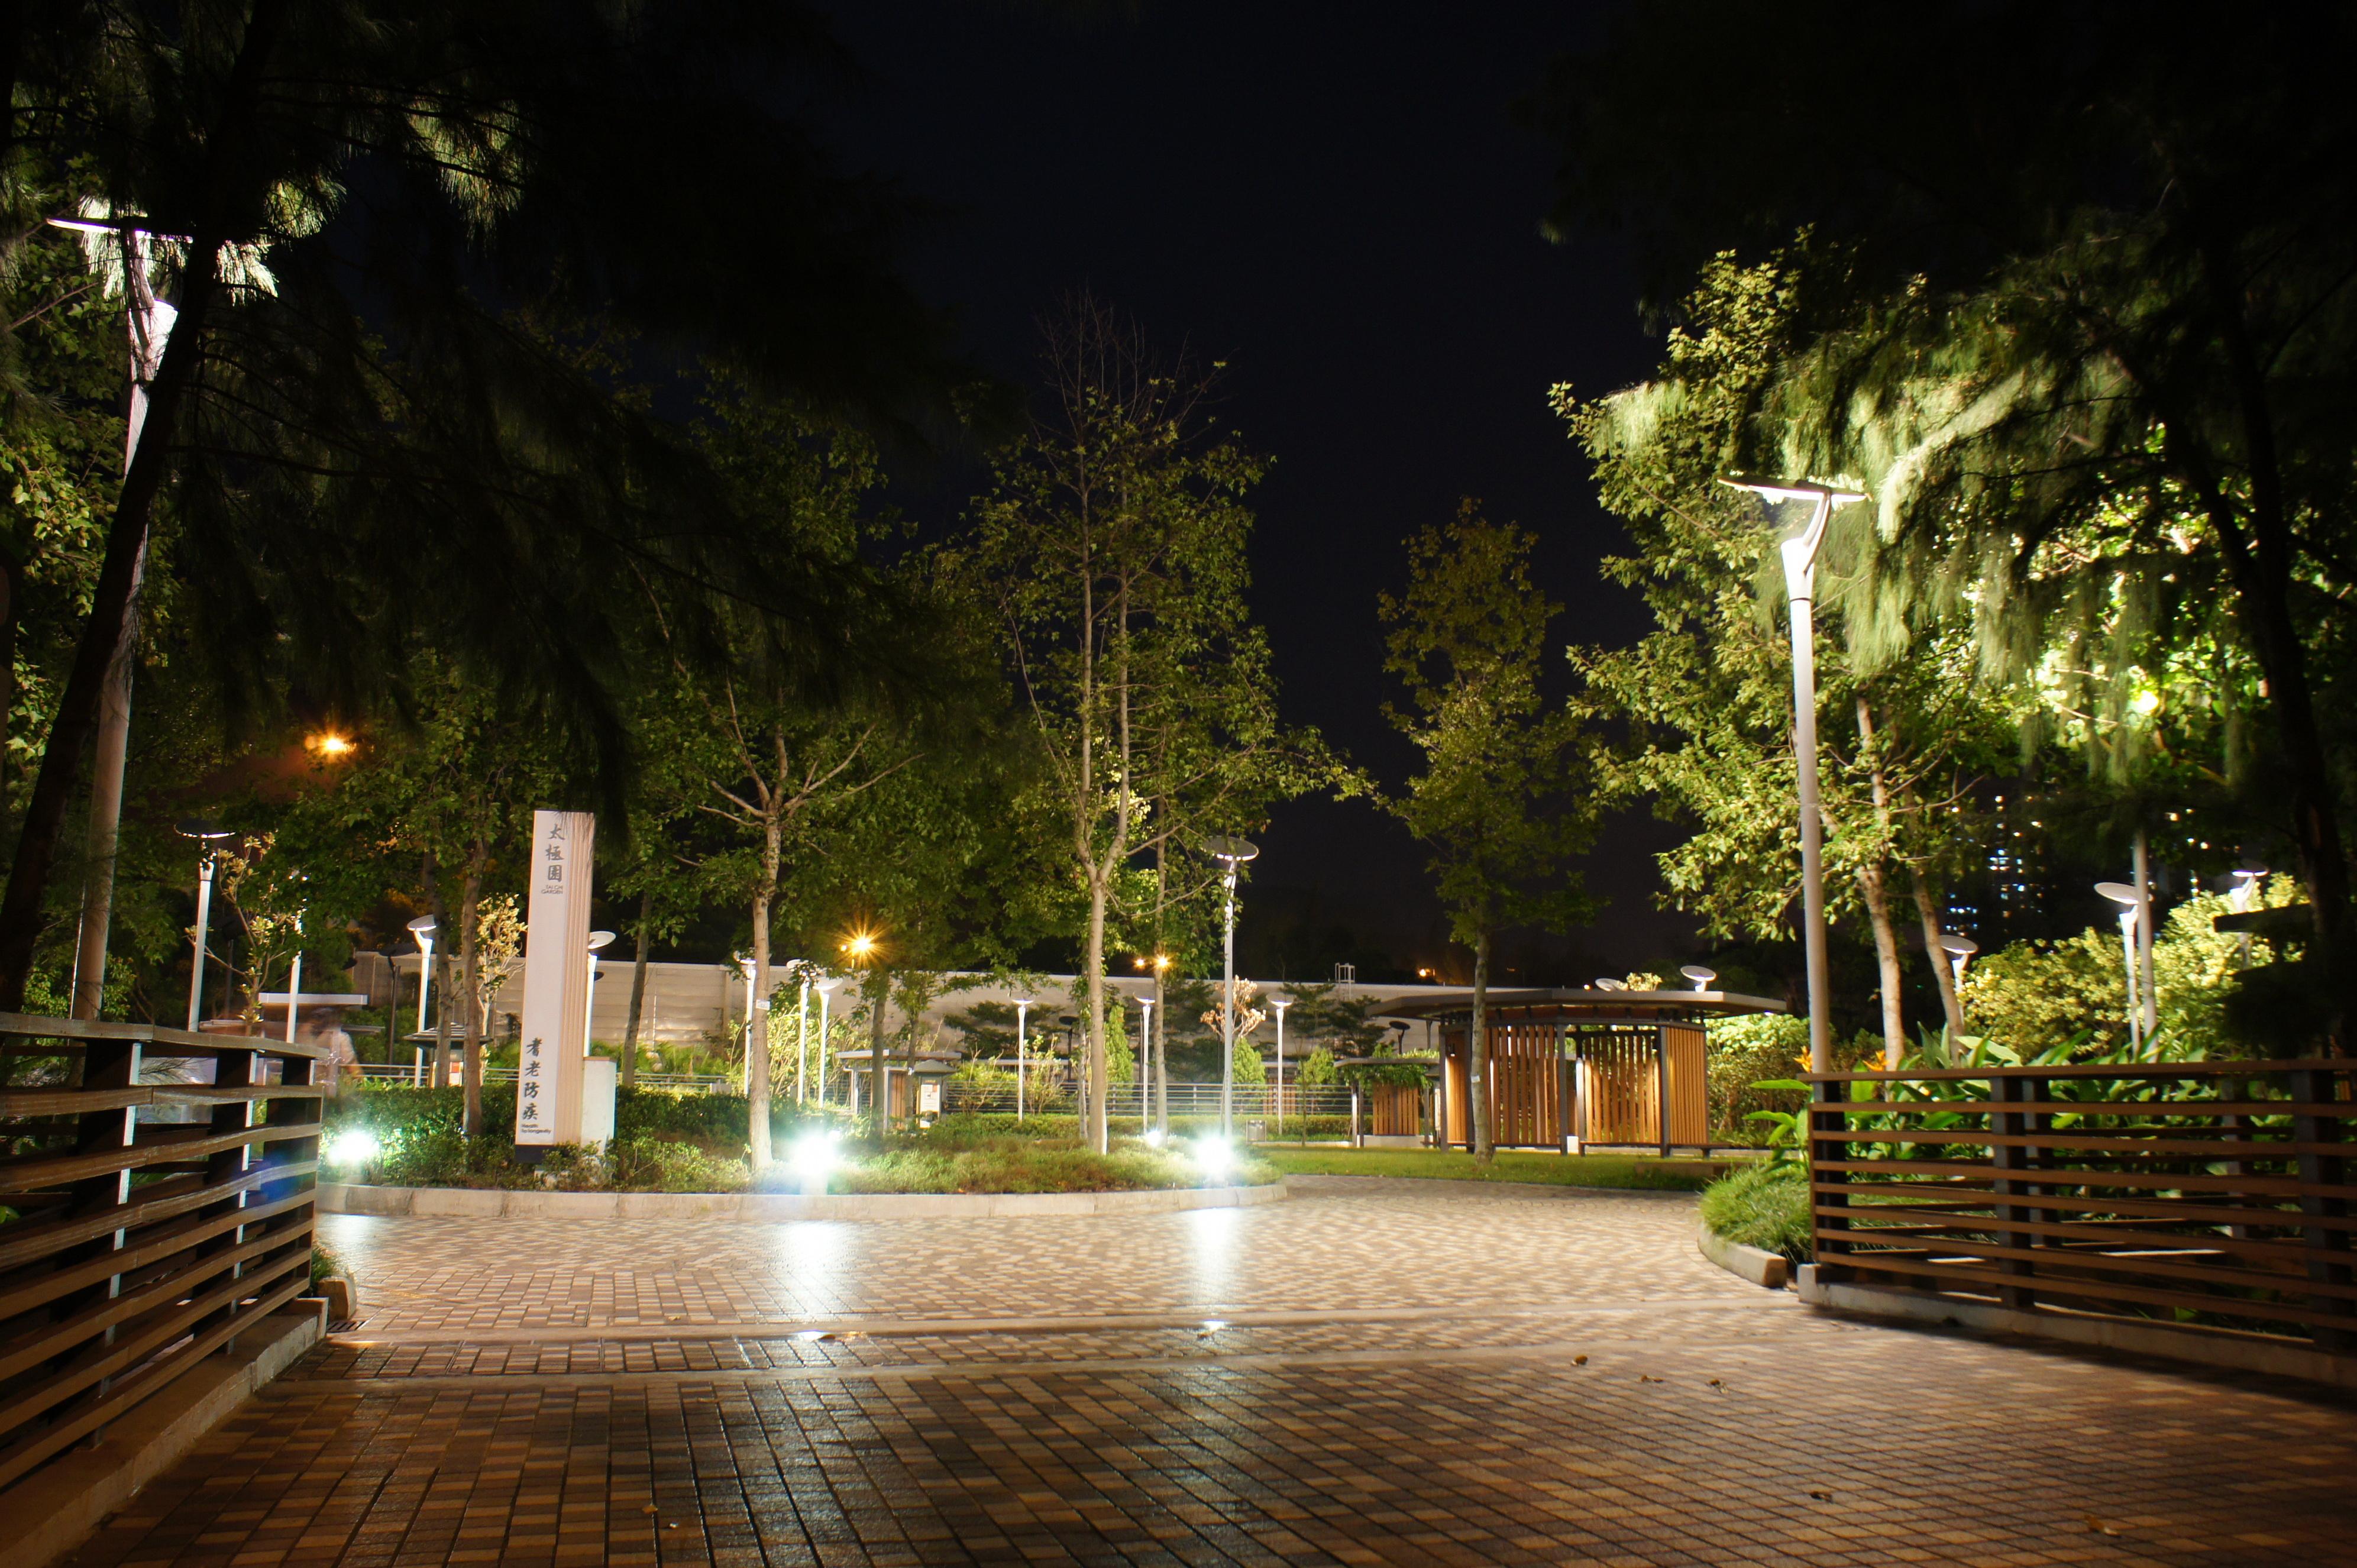 File tung chung north park tai chi garden at night hong kong jpg wikimedia commons for A night at the garden